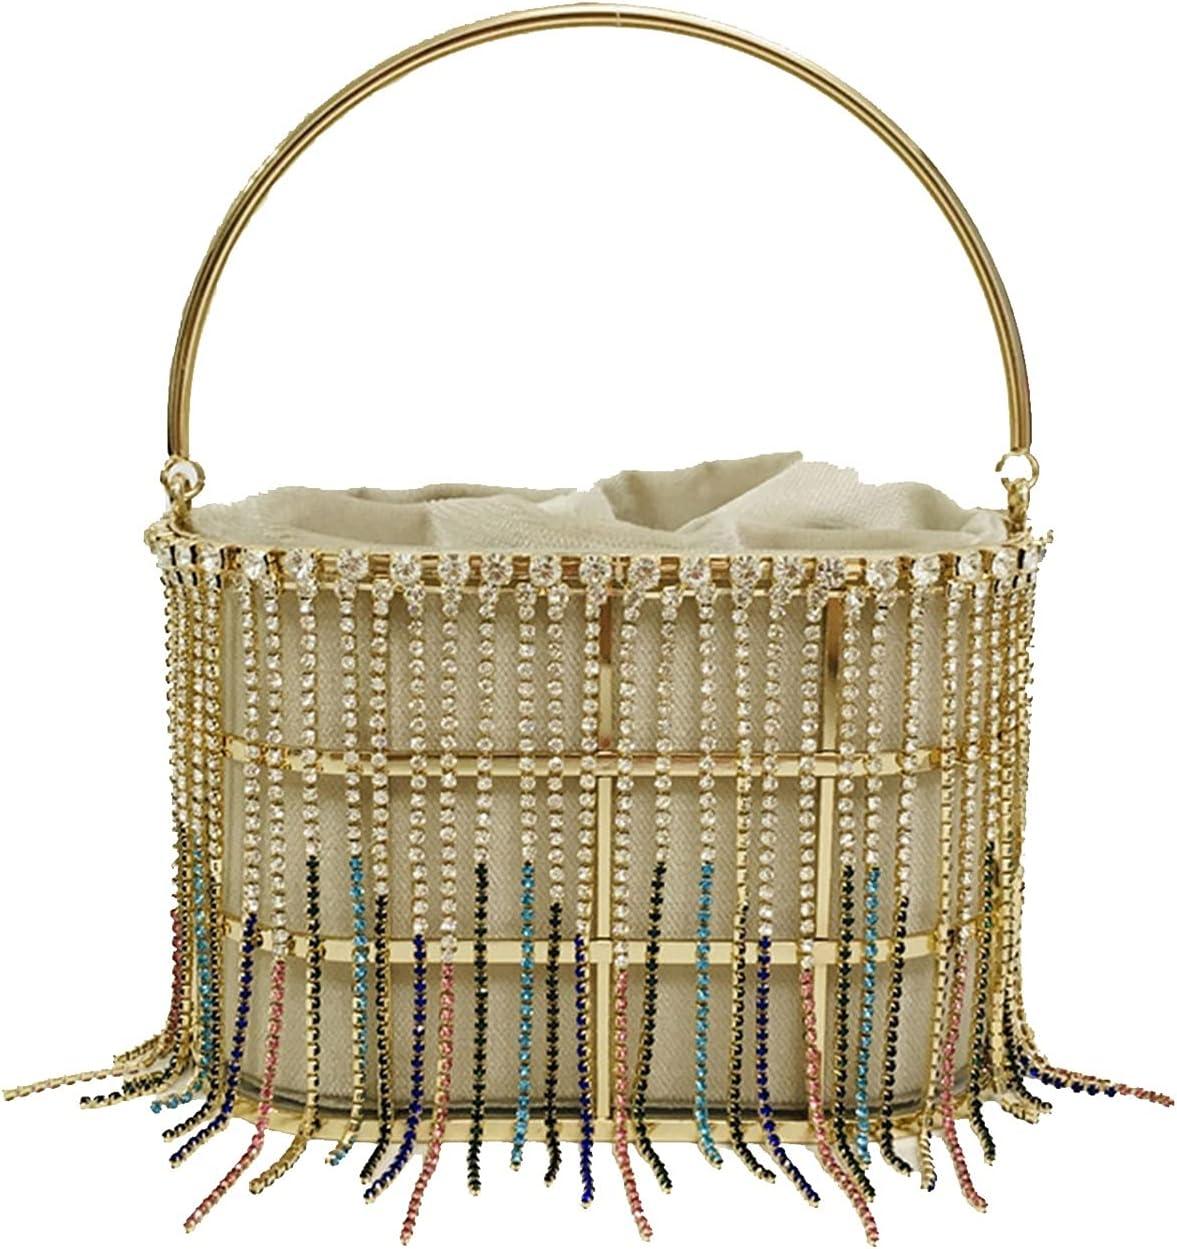 Evening Bag Pearl Women's Luxury Party Handbag Diamonds Clutch Bag Cocktail Evening Bag Openwork Basket Design (Color : Beige, Size : Small)